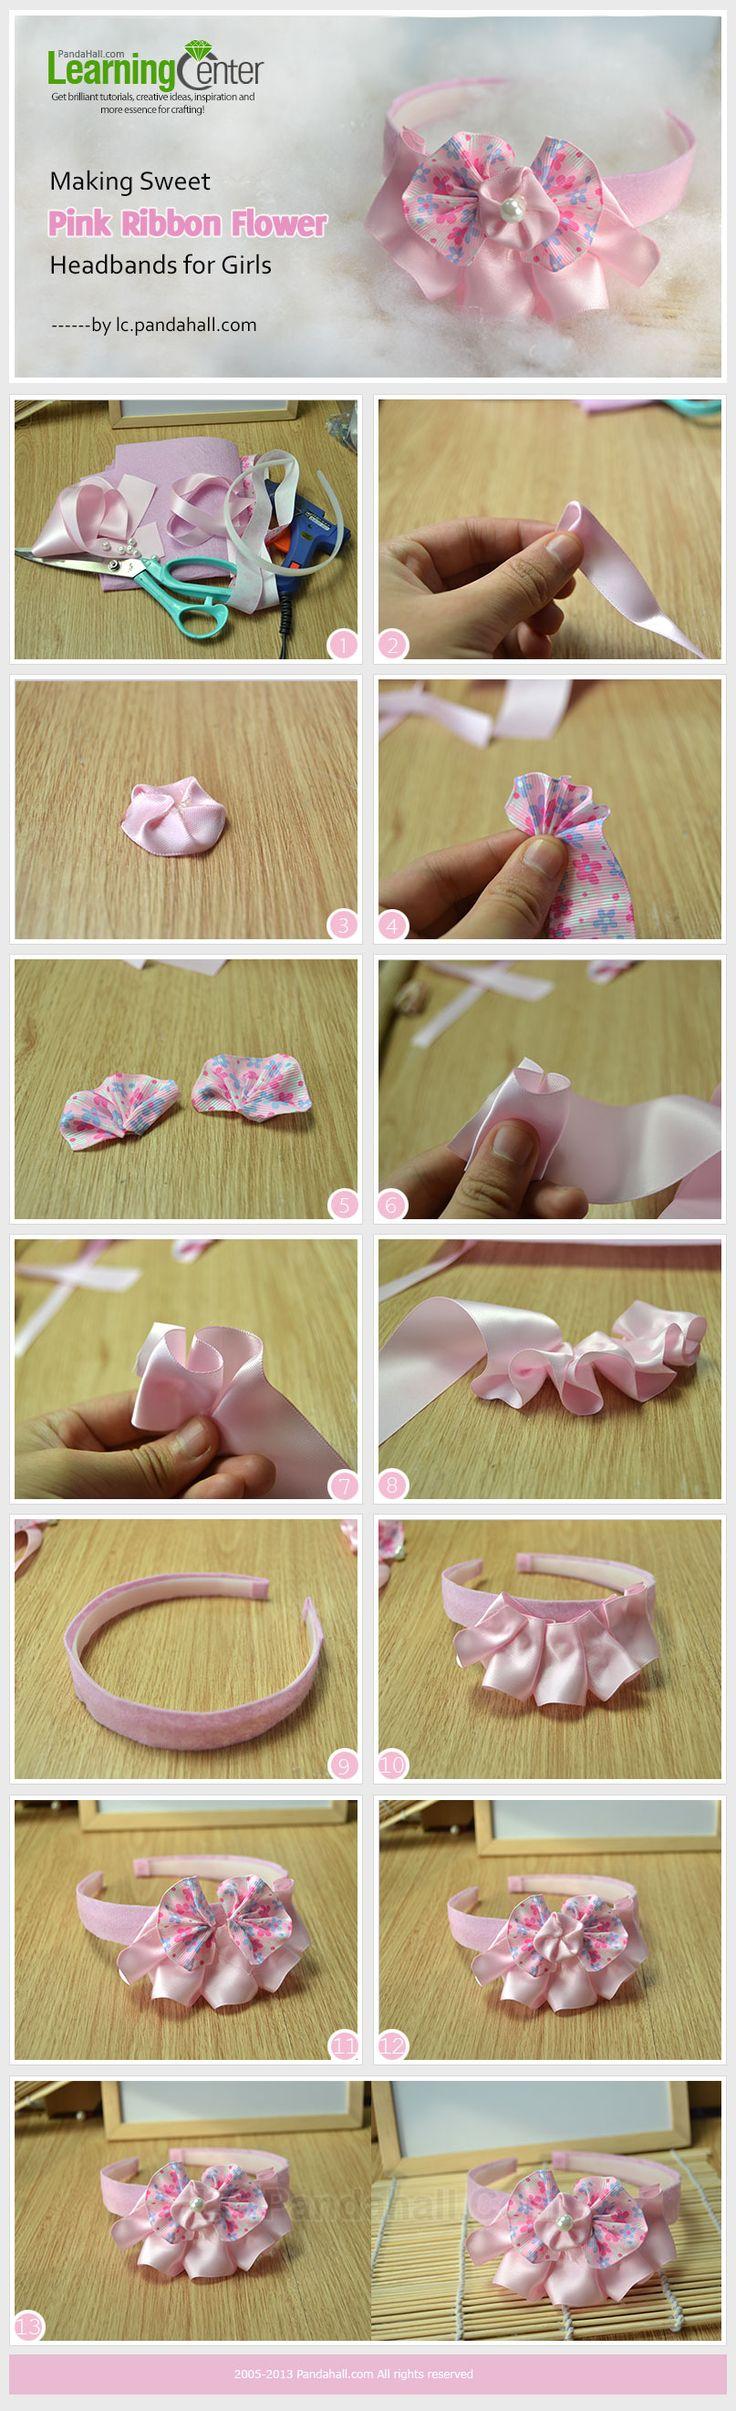 Making Sweet Pink Ribbon Flower Headbands for Girls